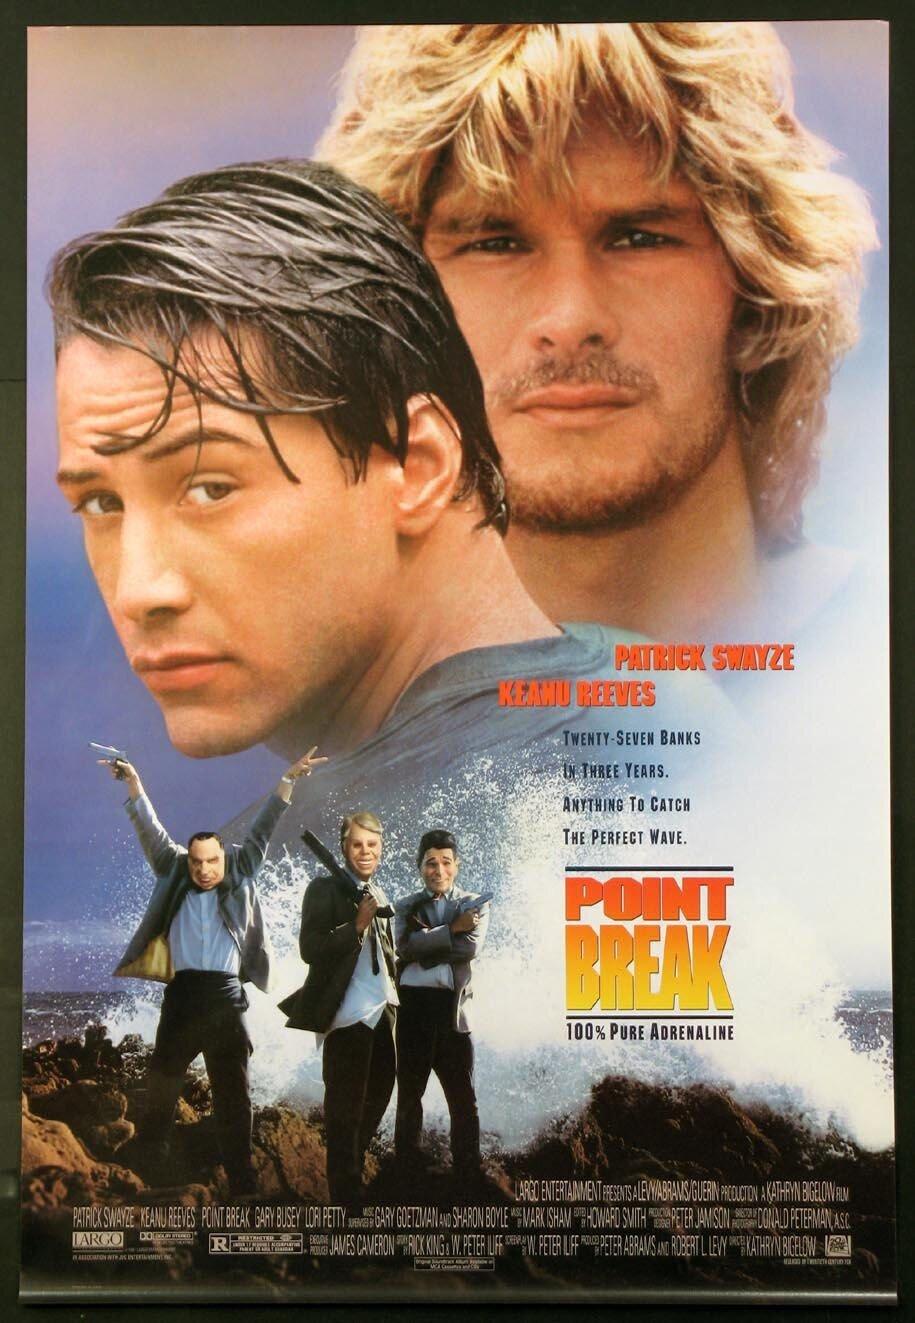 Rohan's favourite movie, the classic Point Break